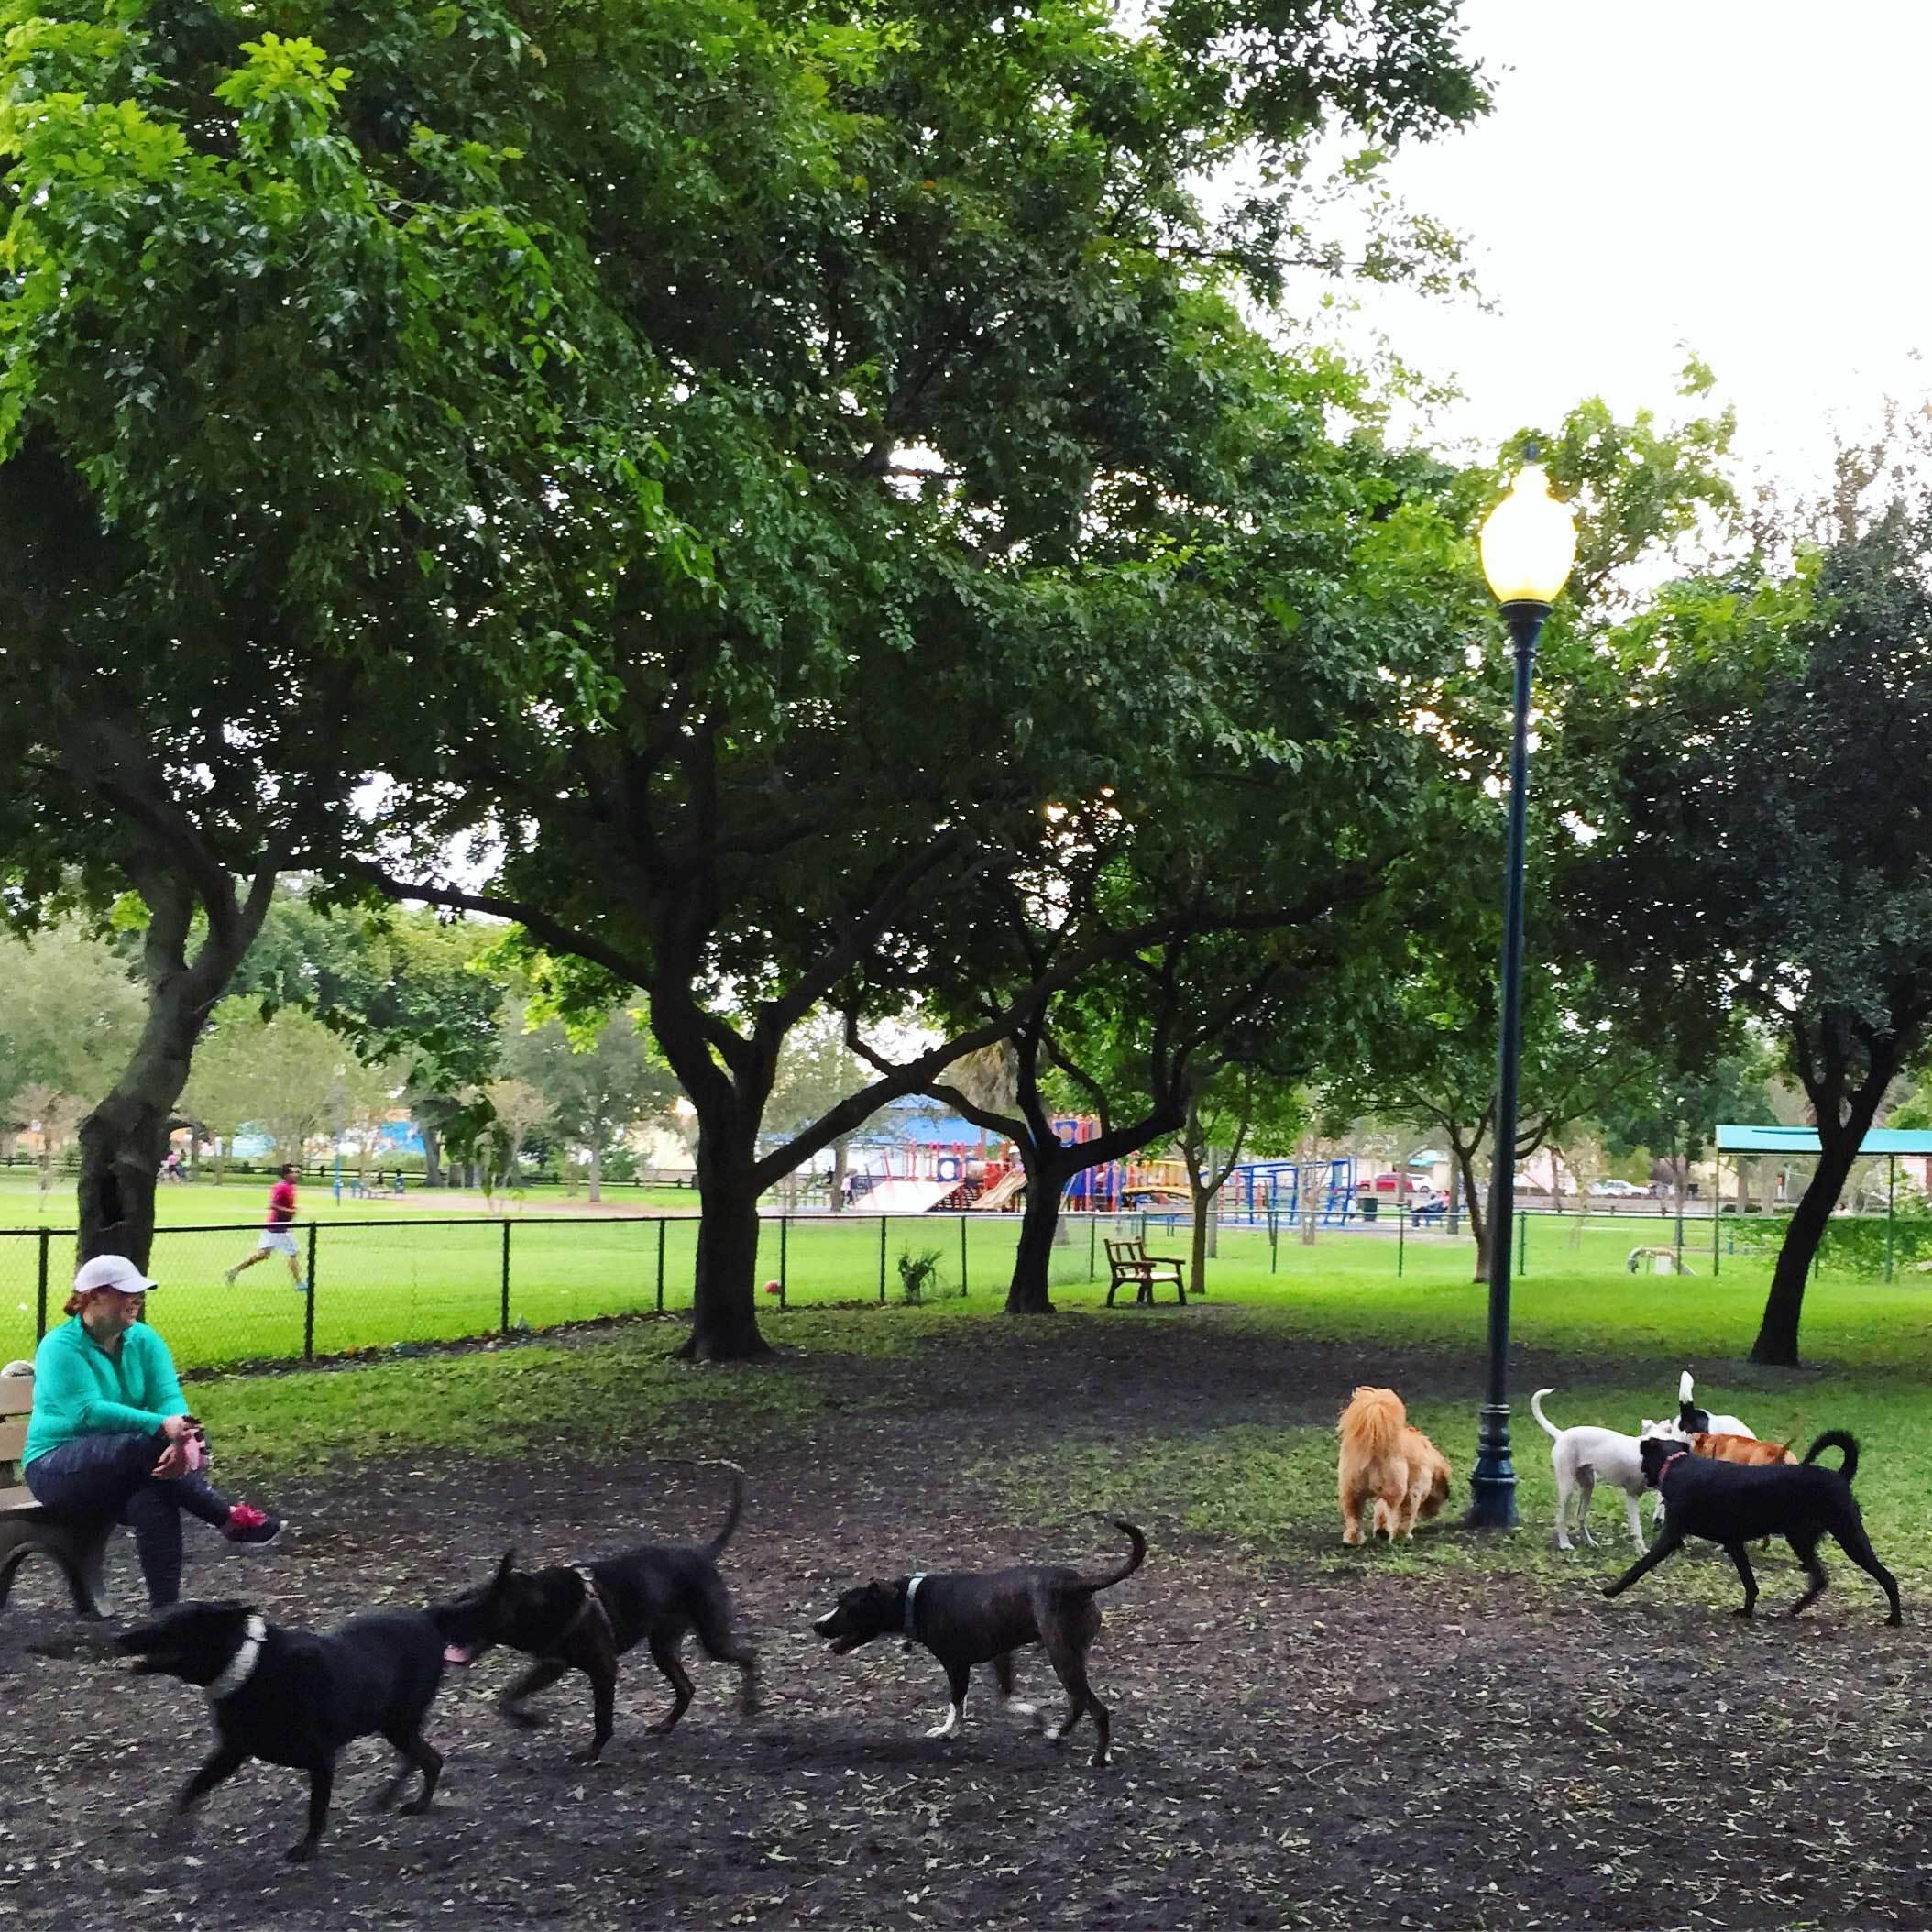 Dog park in West Palm Beach, Florida